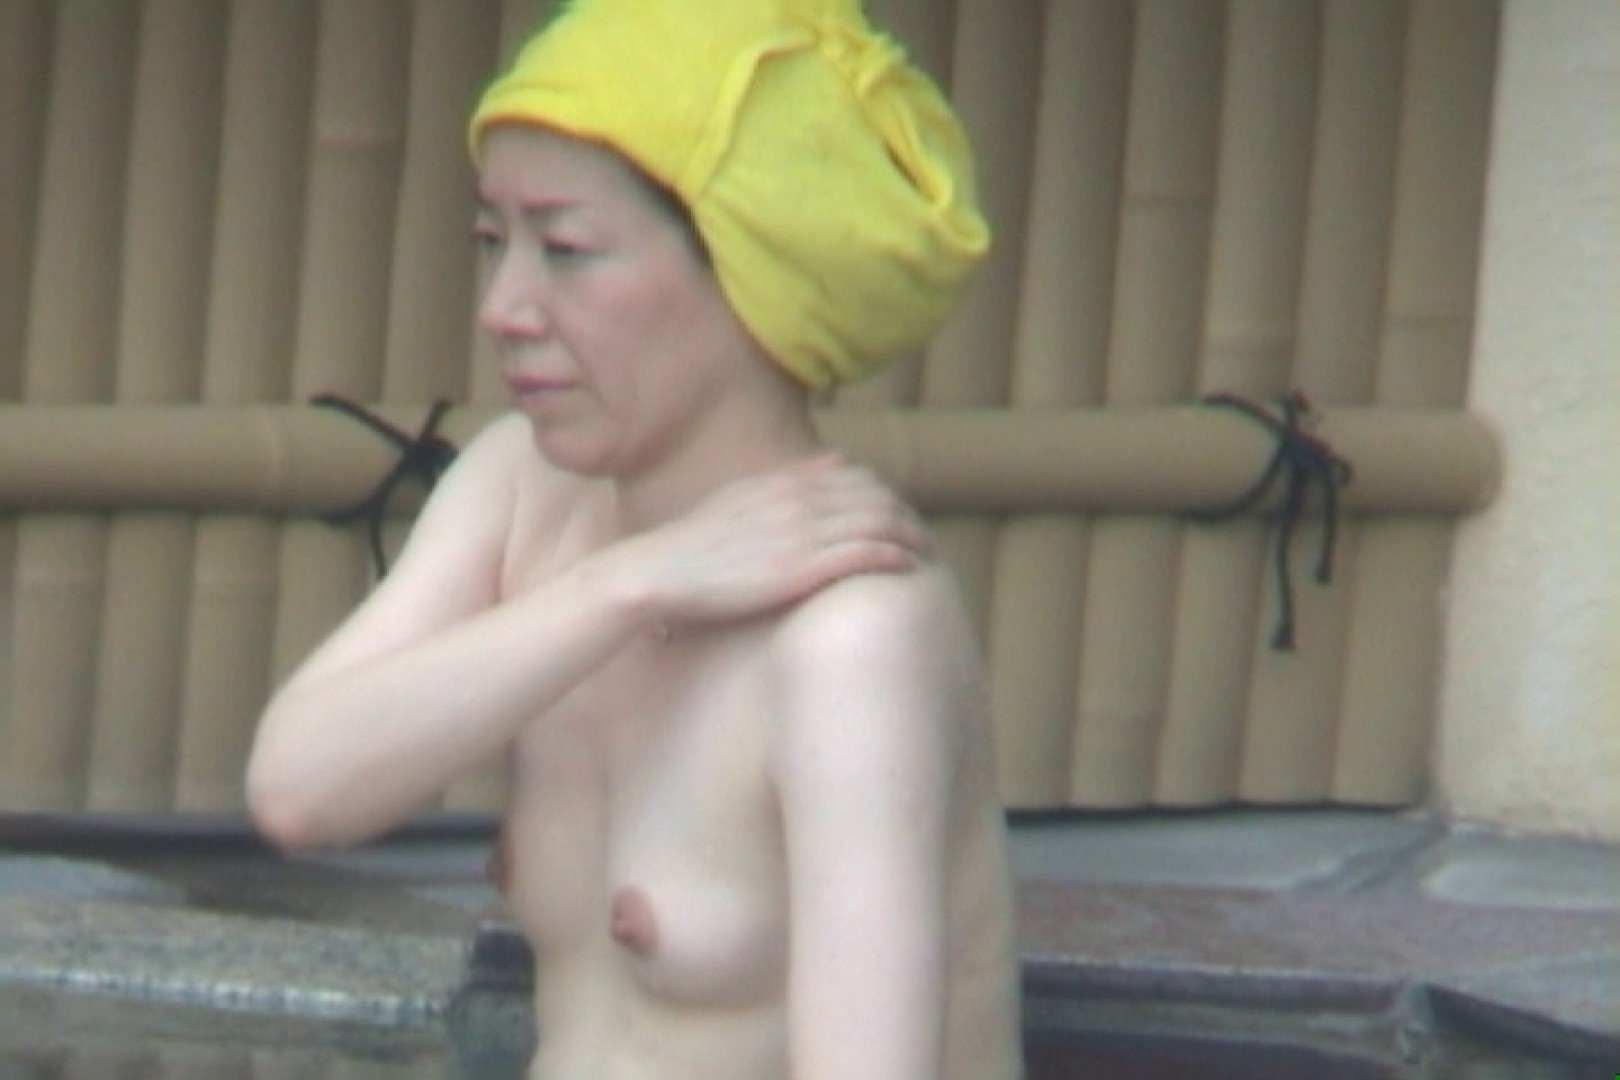 Aquaな露天風呂Vol.569 盗撮シリーズ | 露天風呂編  84PIX 71